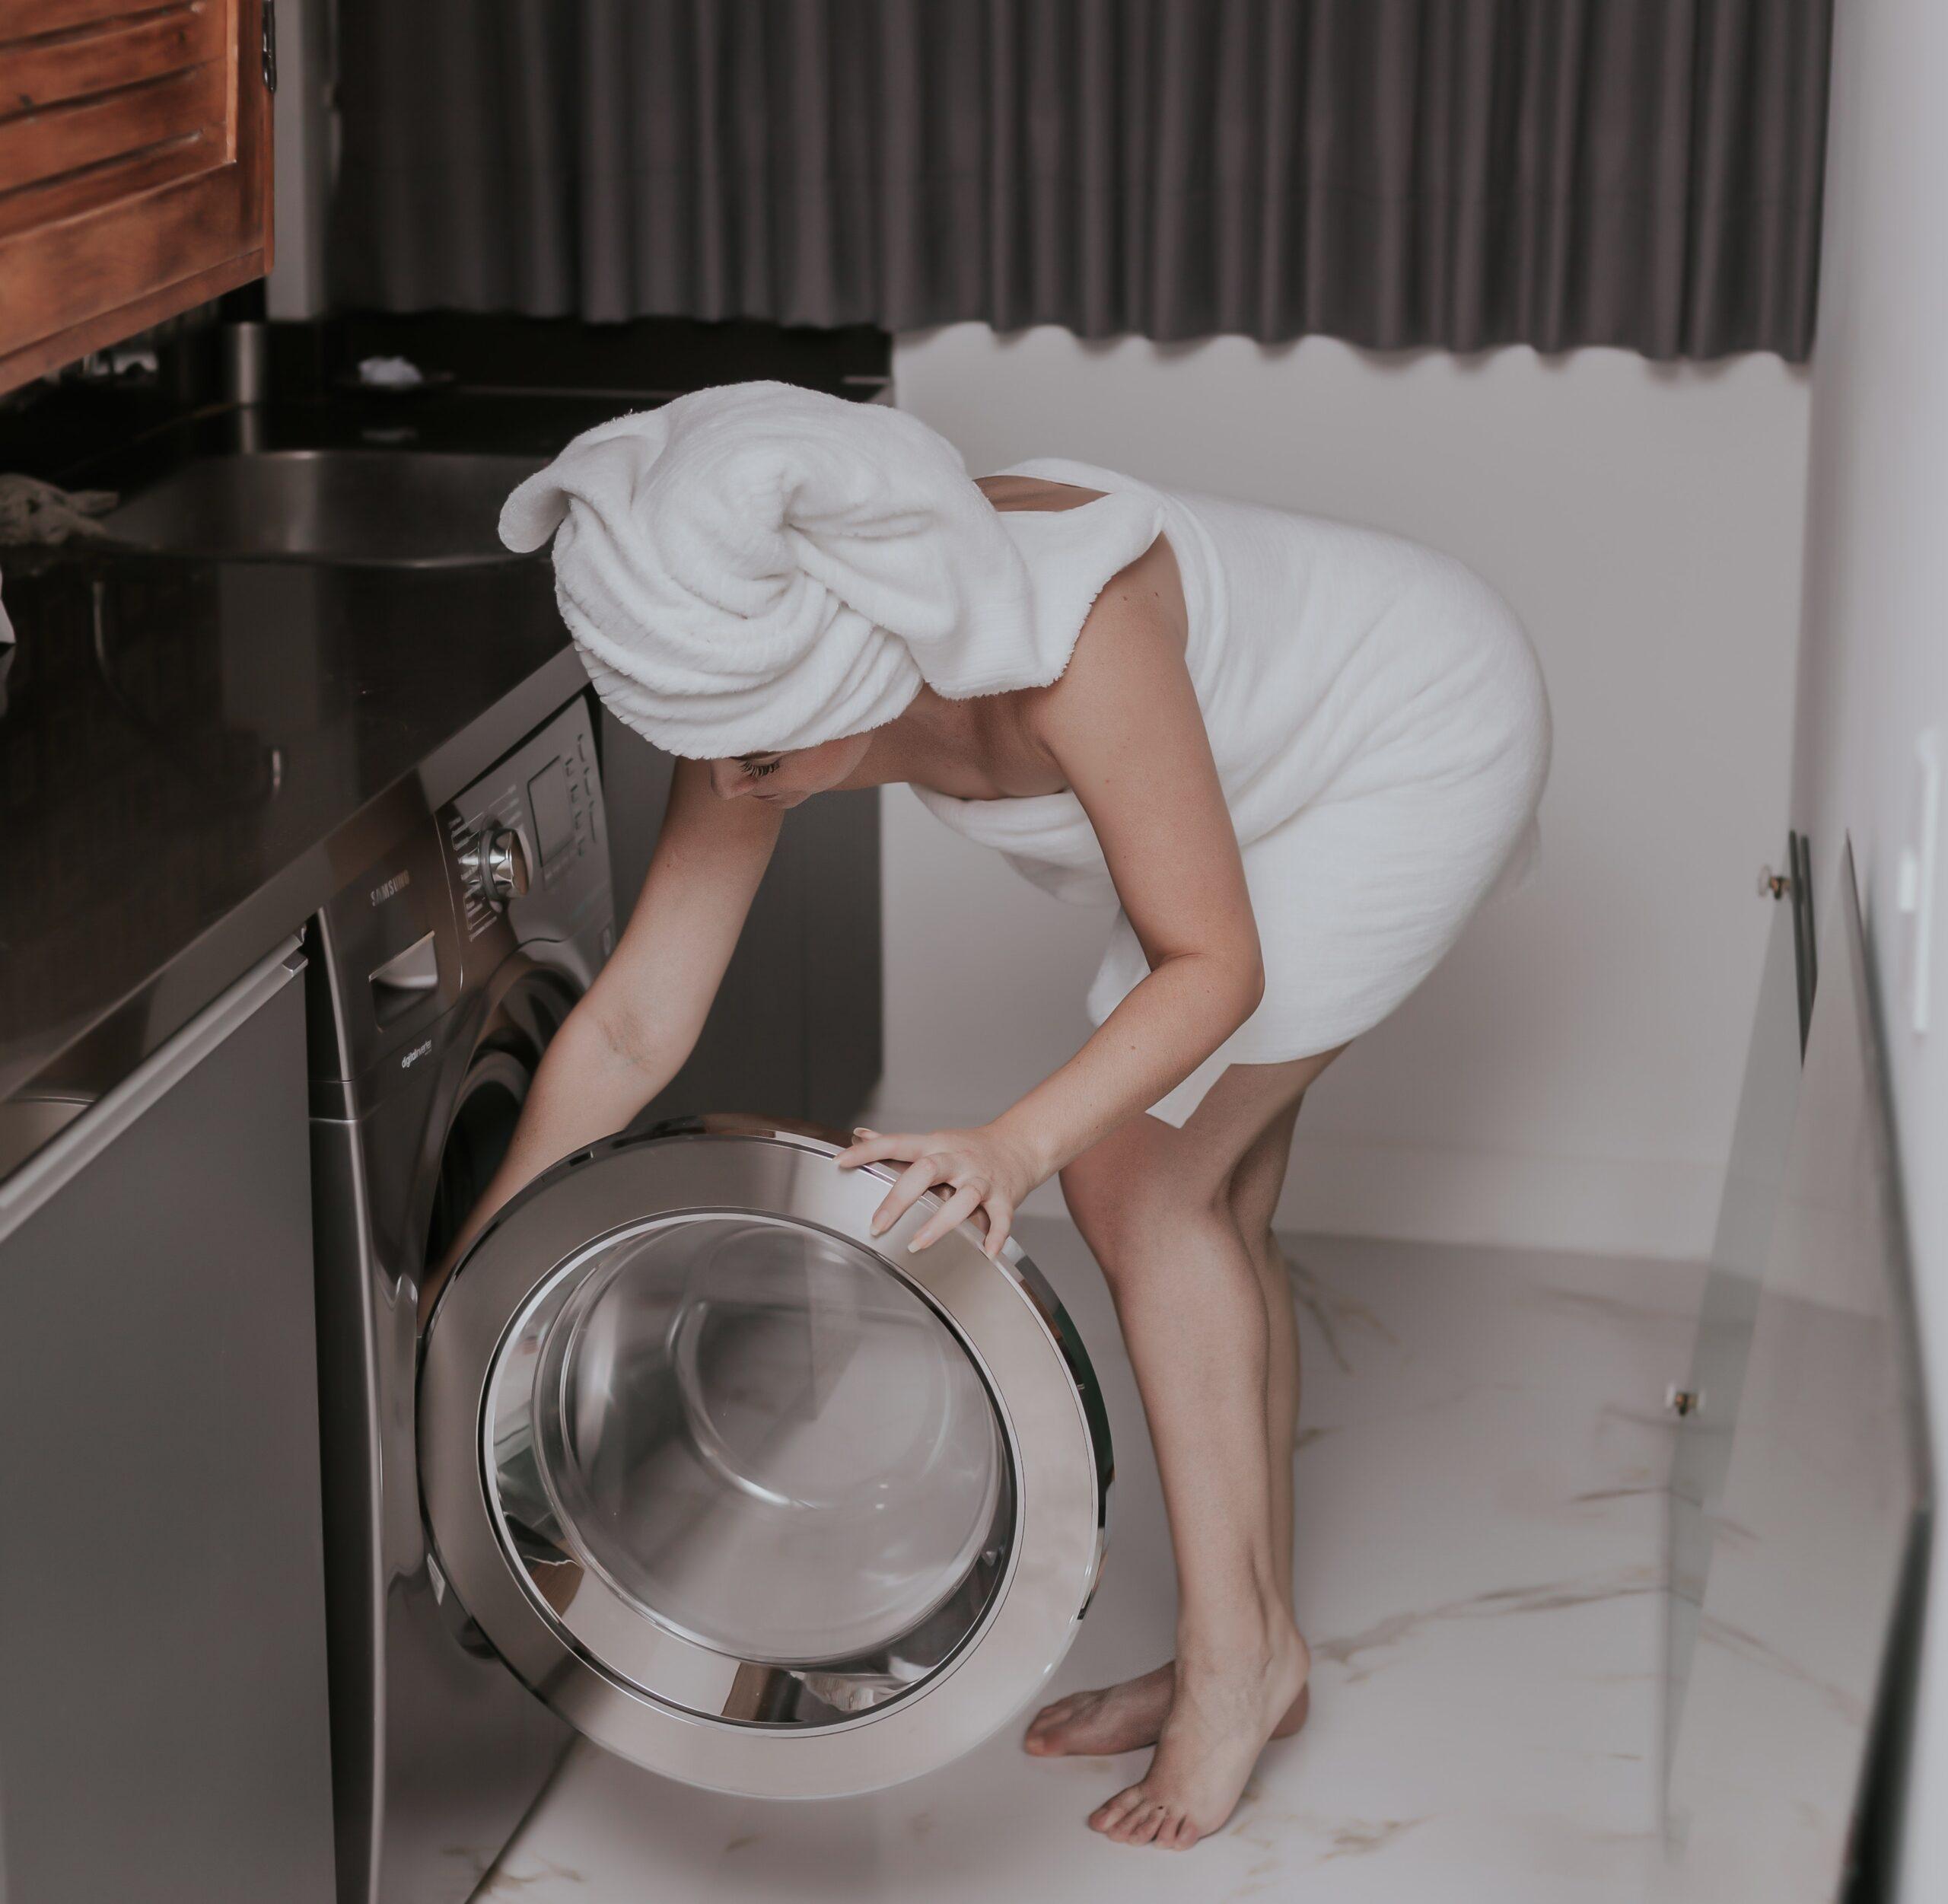 How to Wash Bath Towels